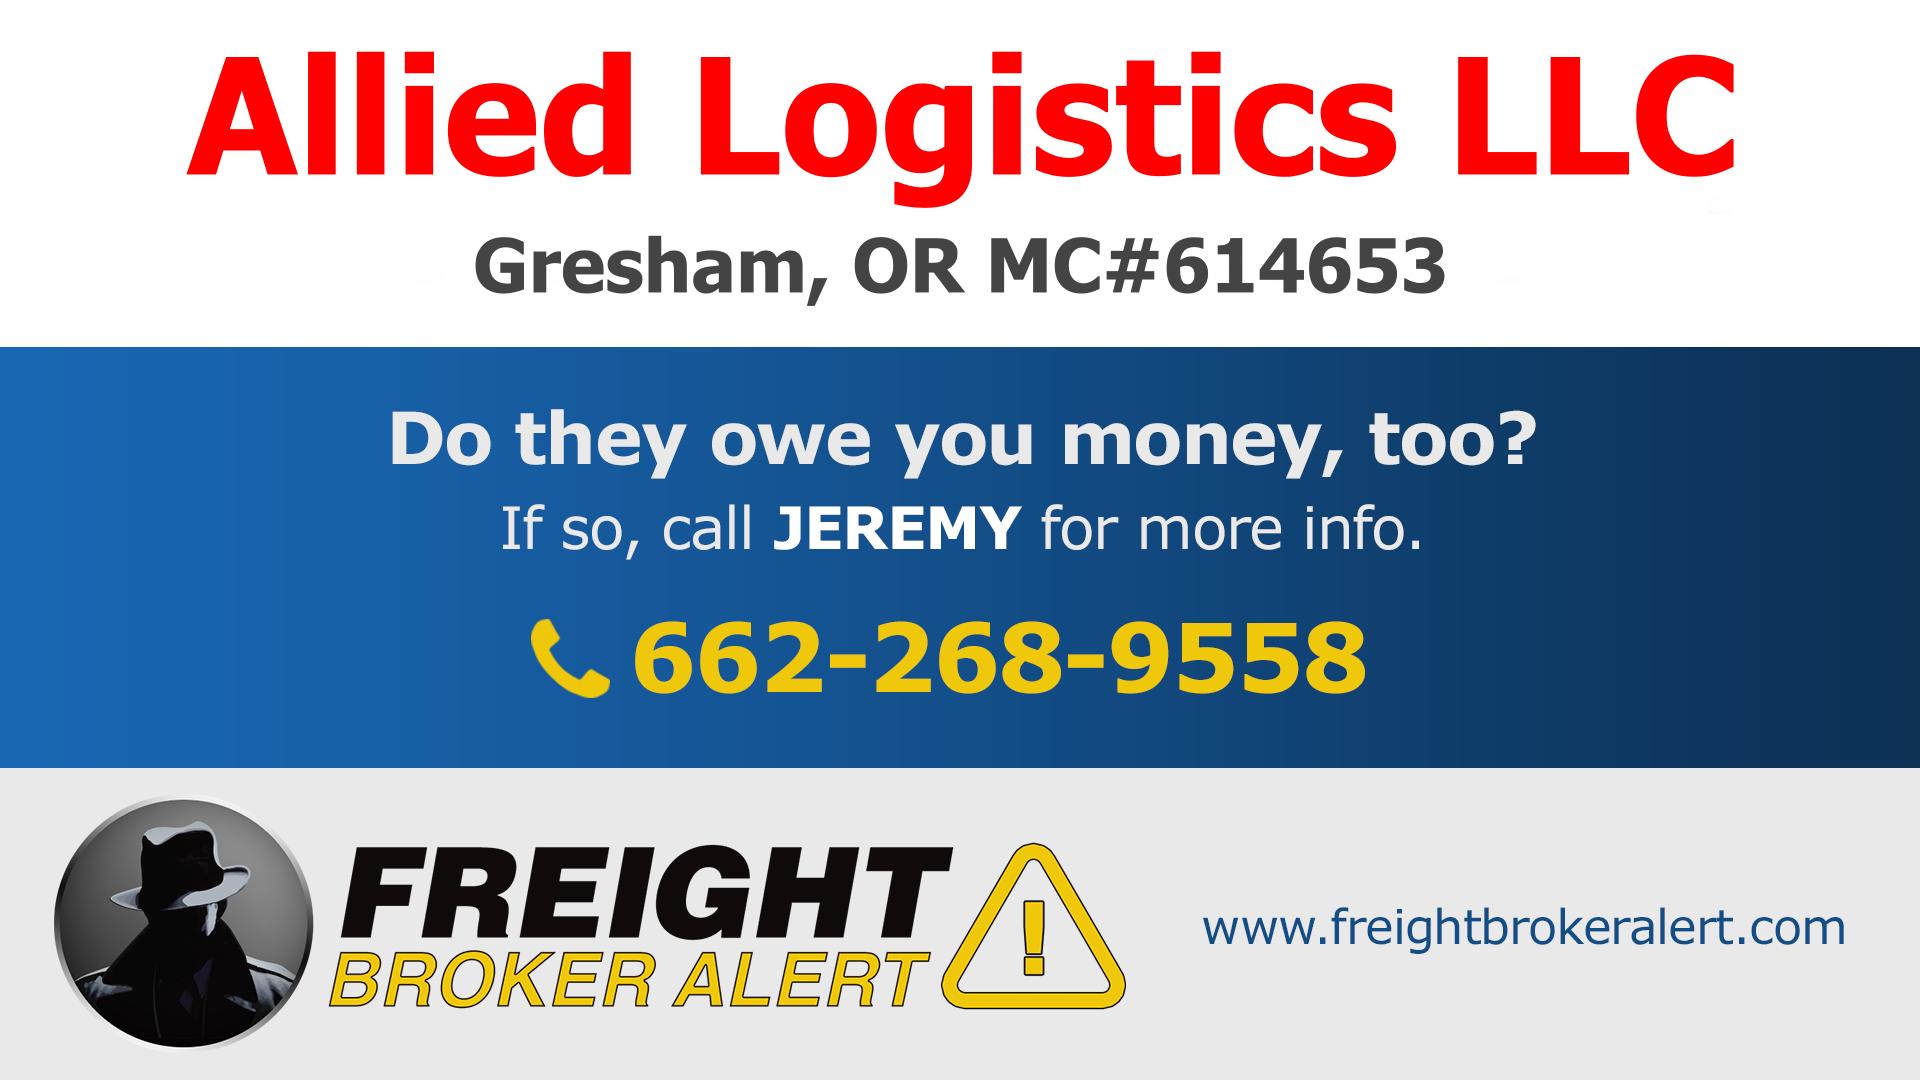 Allied Logistics LLC Oregon